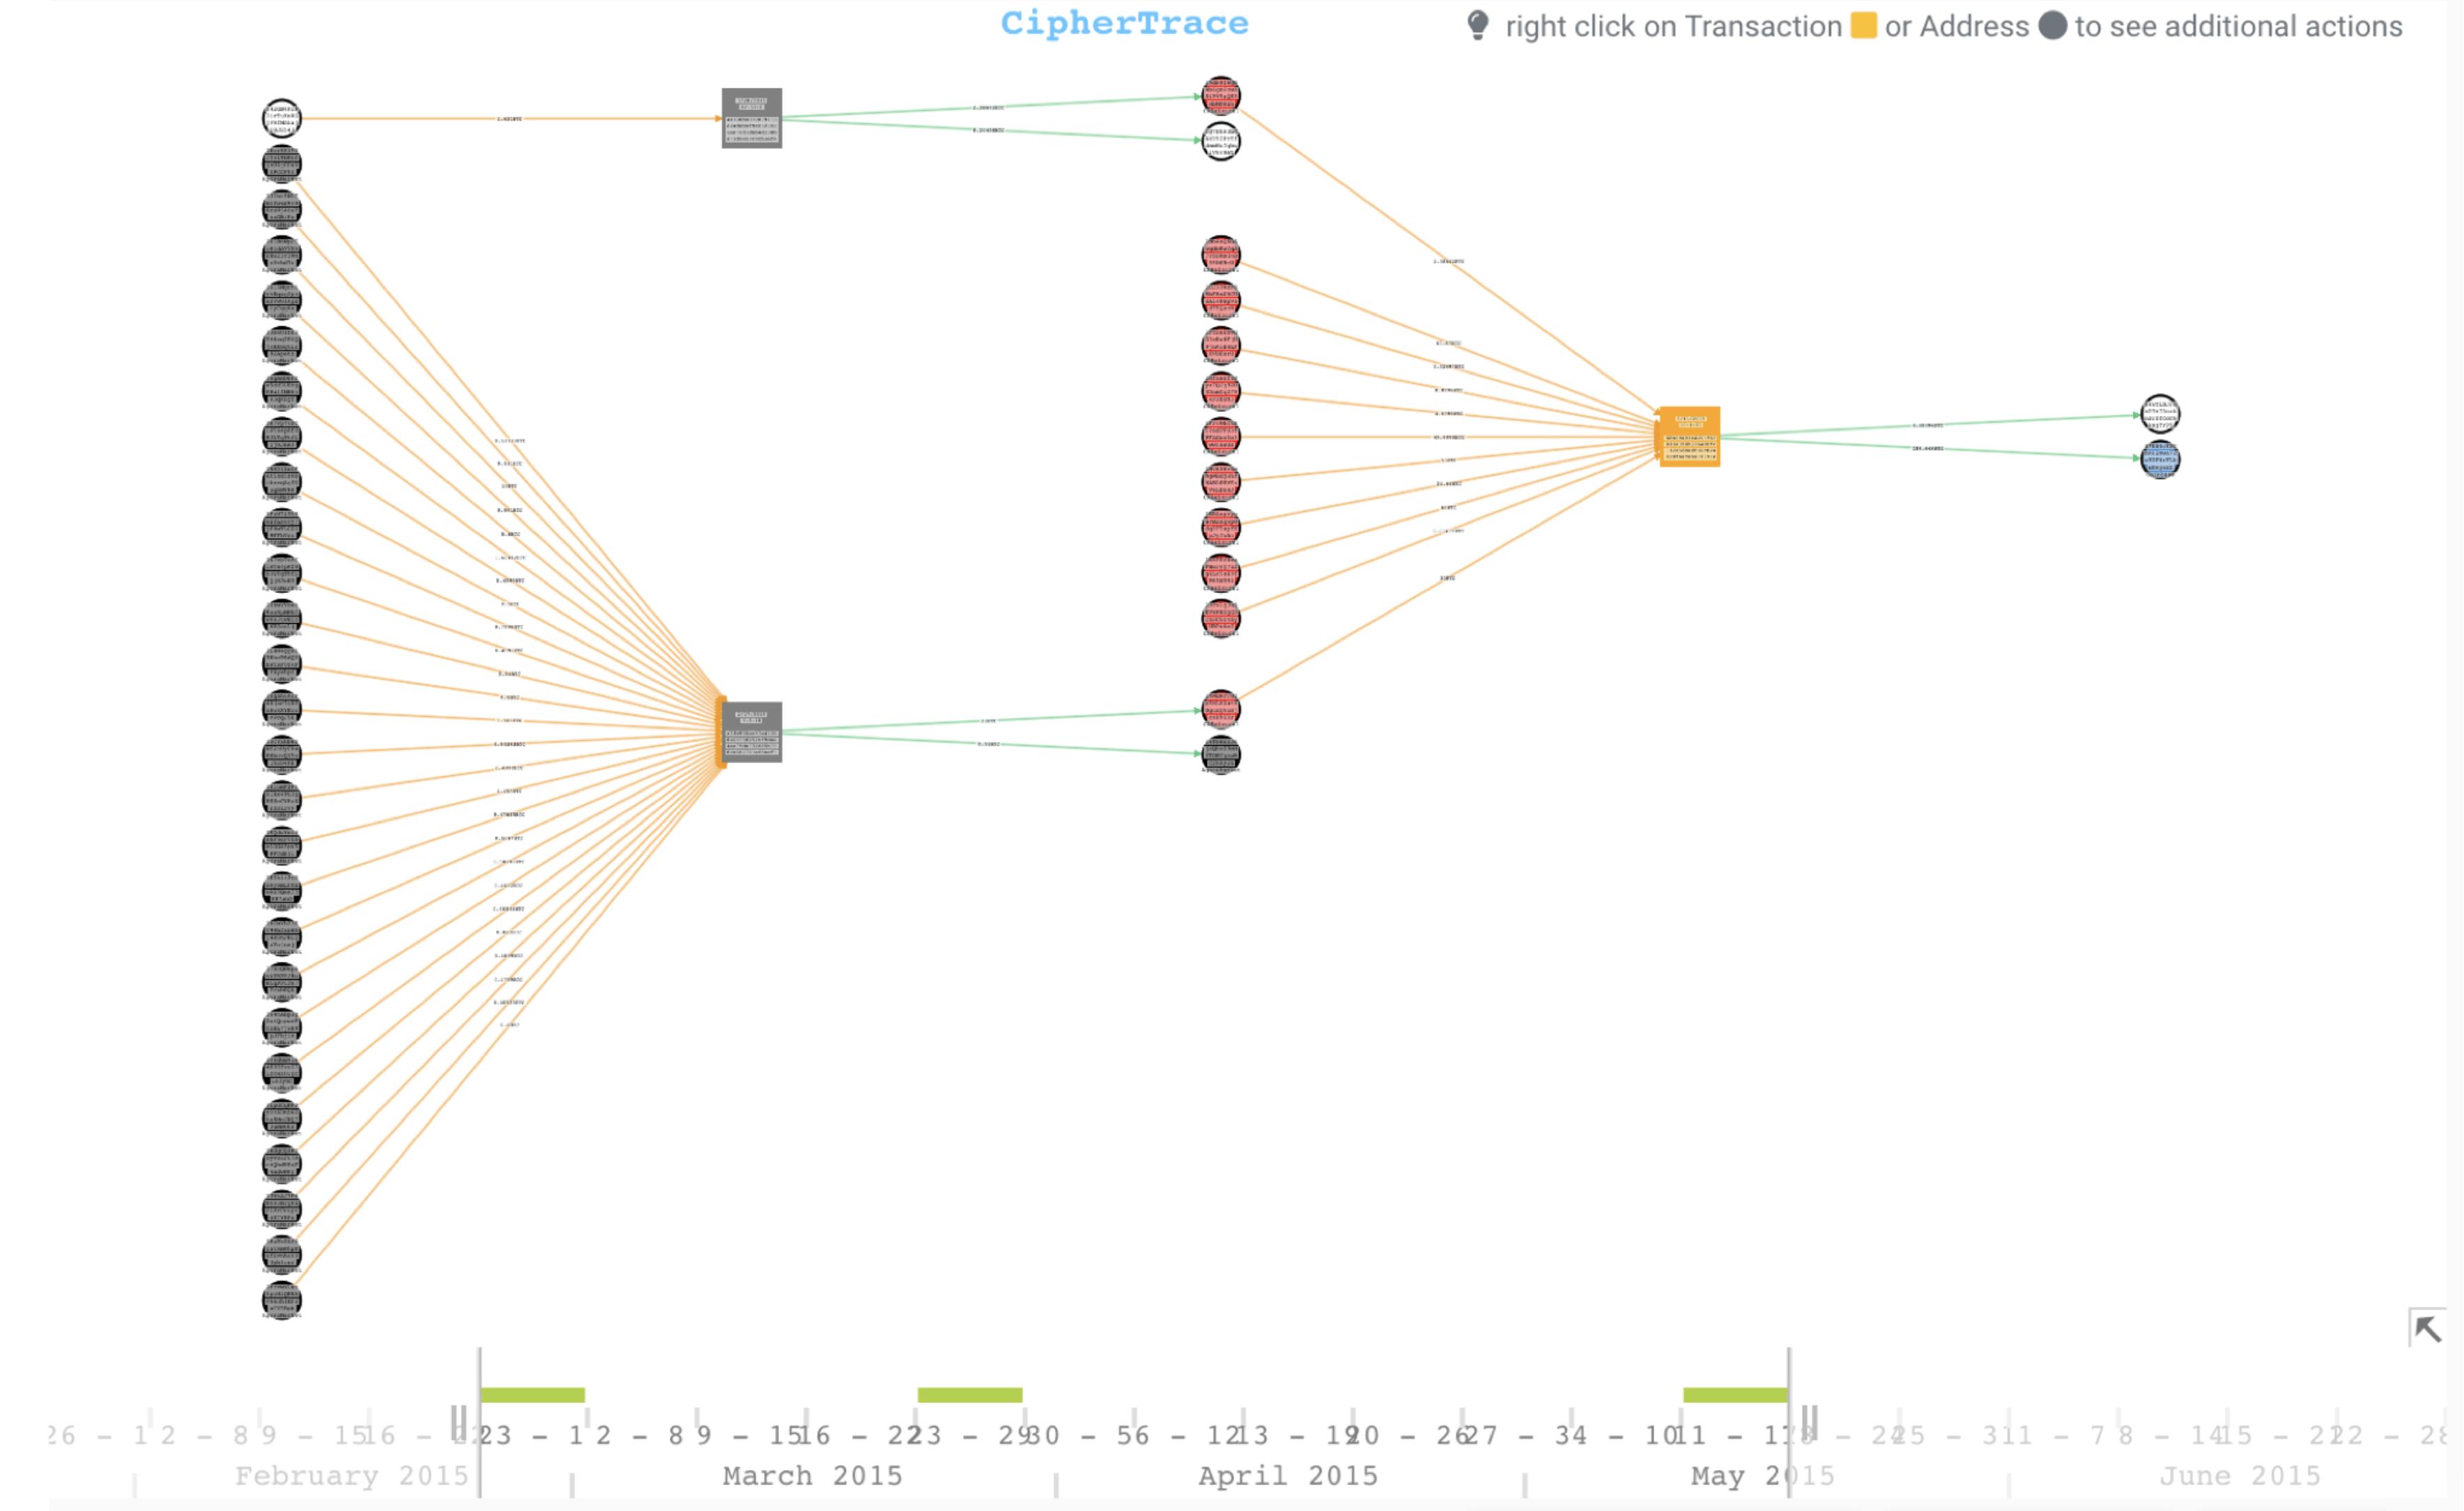 EXMO CipherTrace illustration